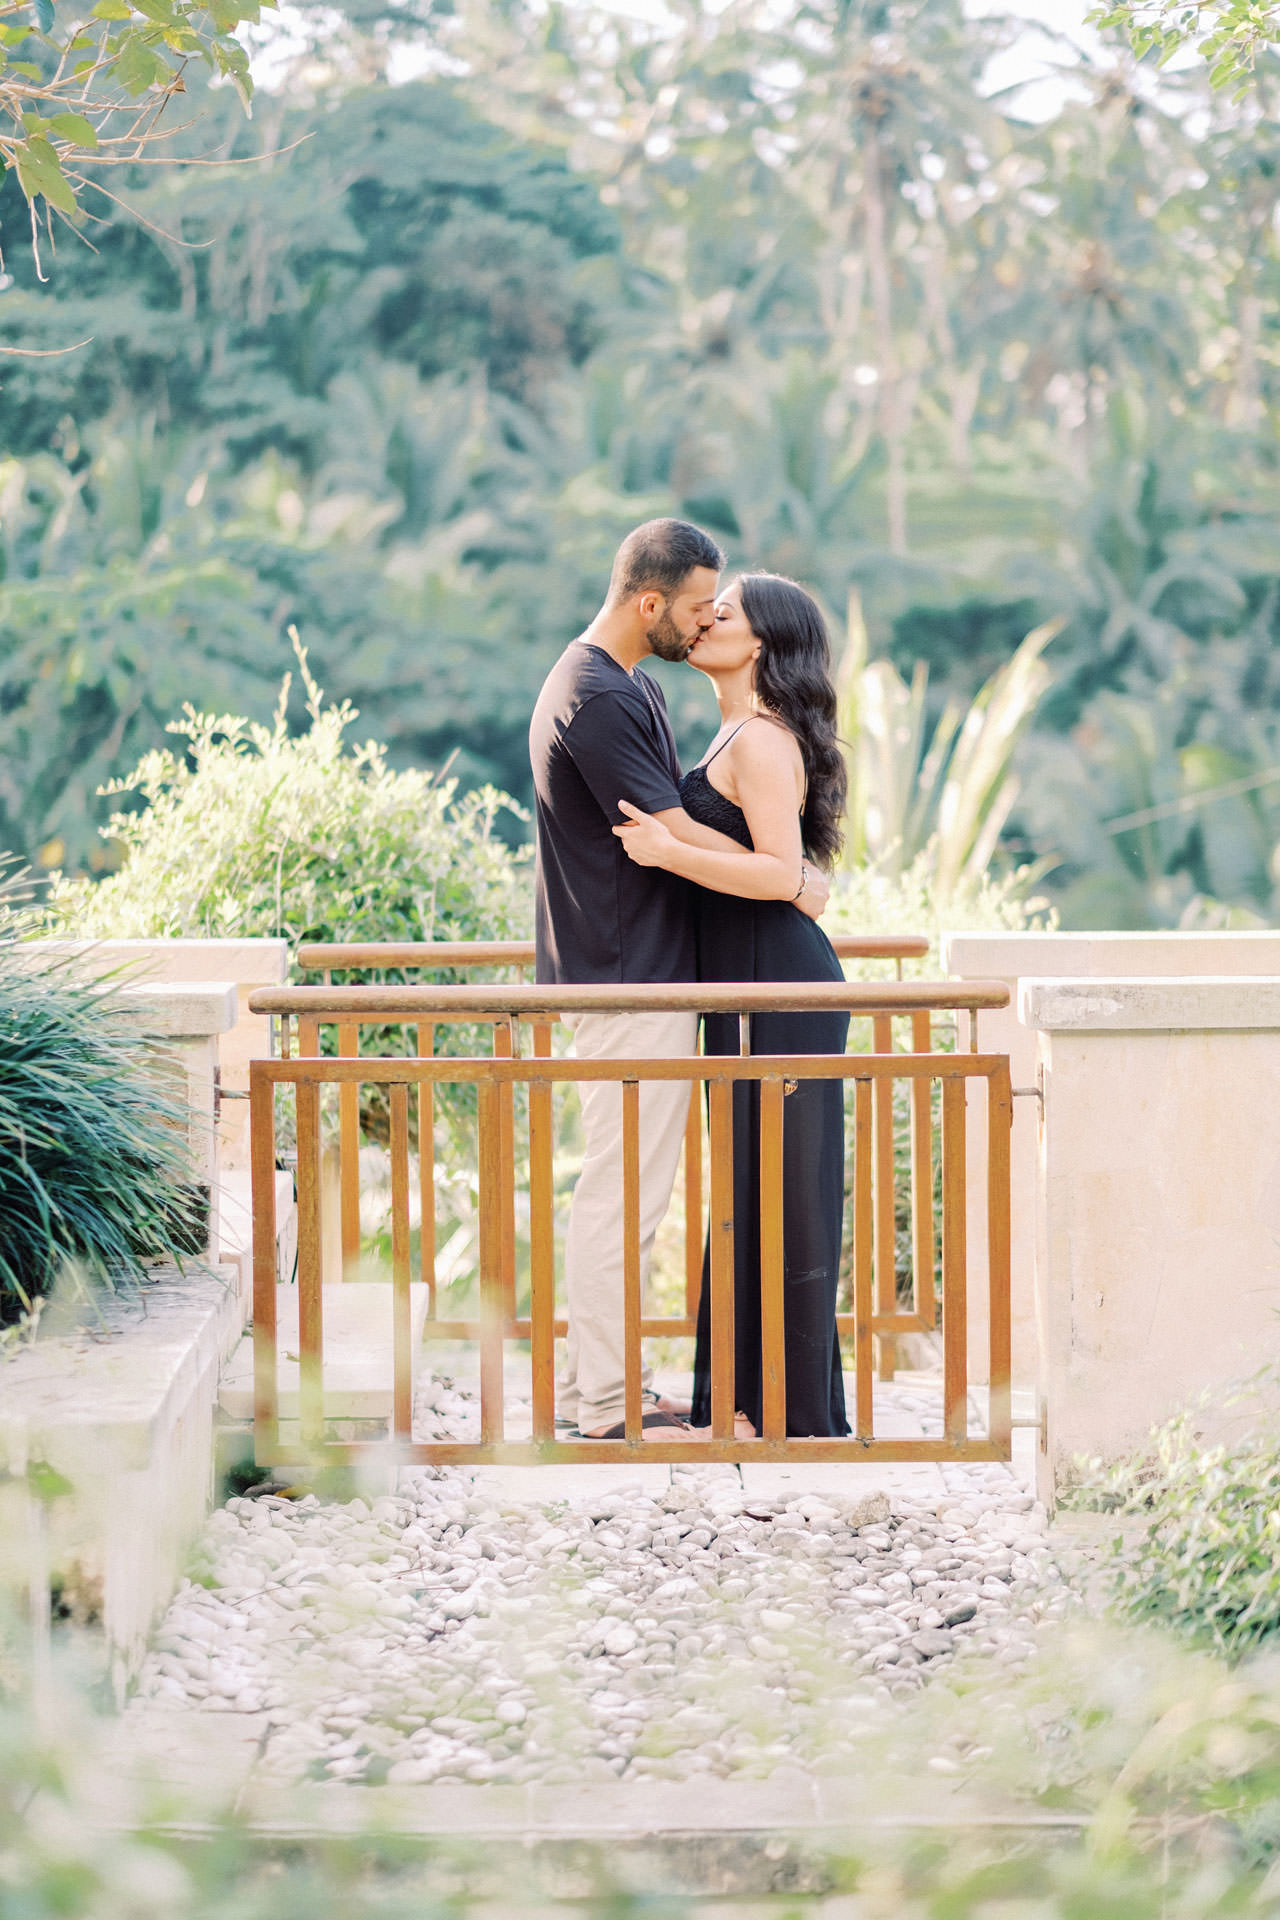 Honeymoon Photo Session at The World's Best Resort 17